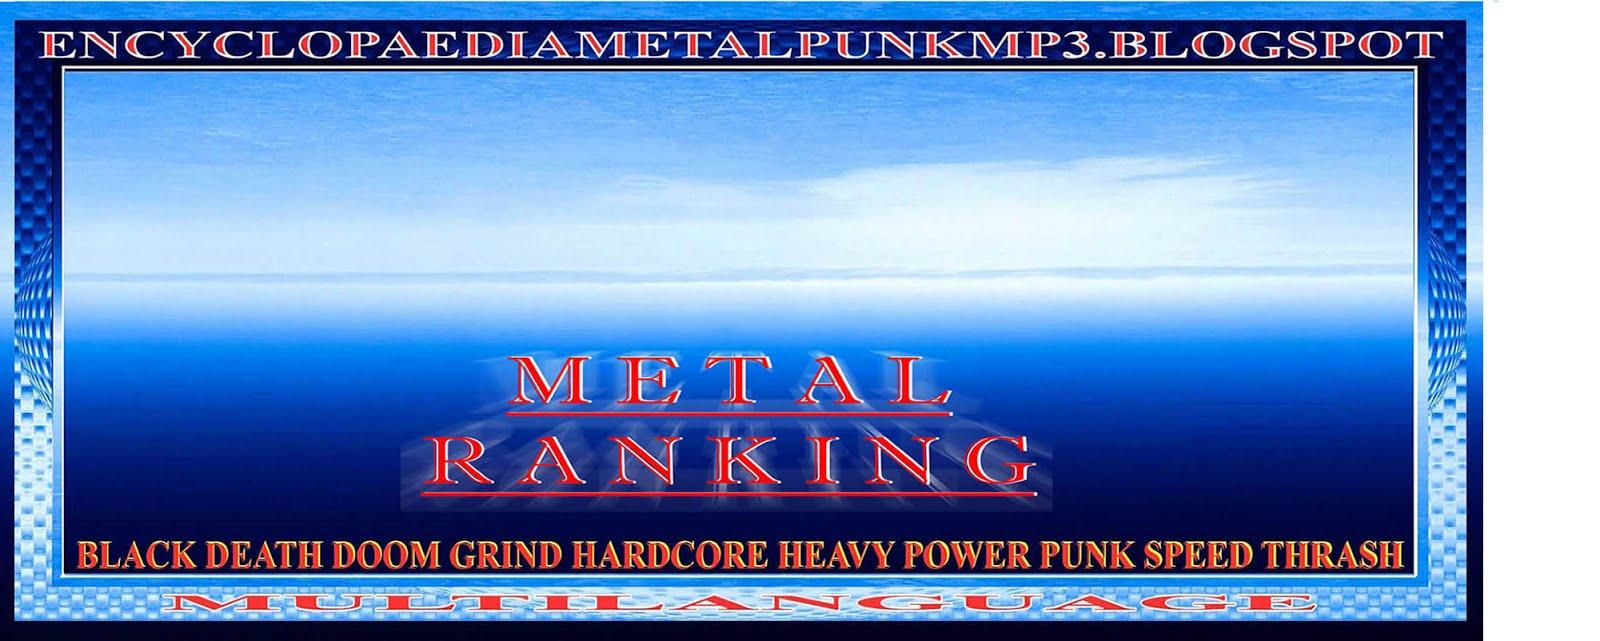 Encyclopaediametalmp3ranking.blogspot.com